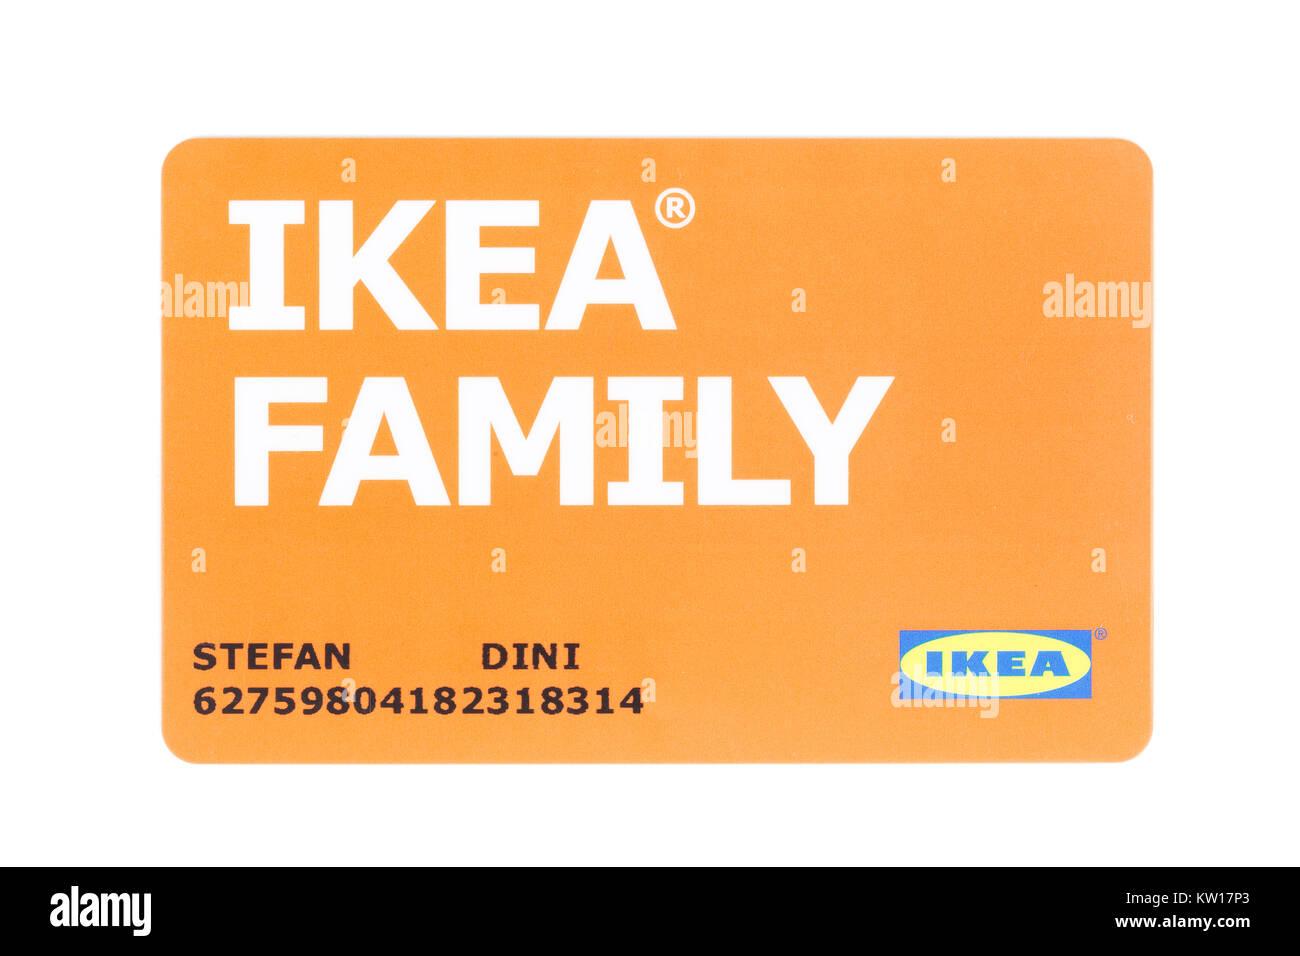 Ikea Espagne Carte.Carte Ikea Family Banque D Images Photo Stock 170287771